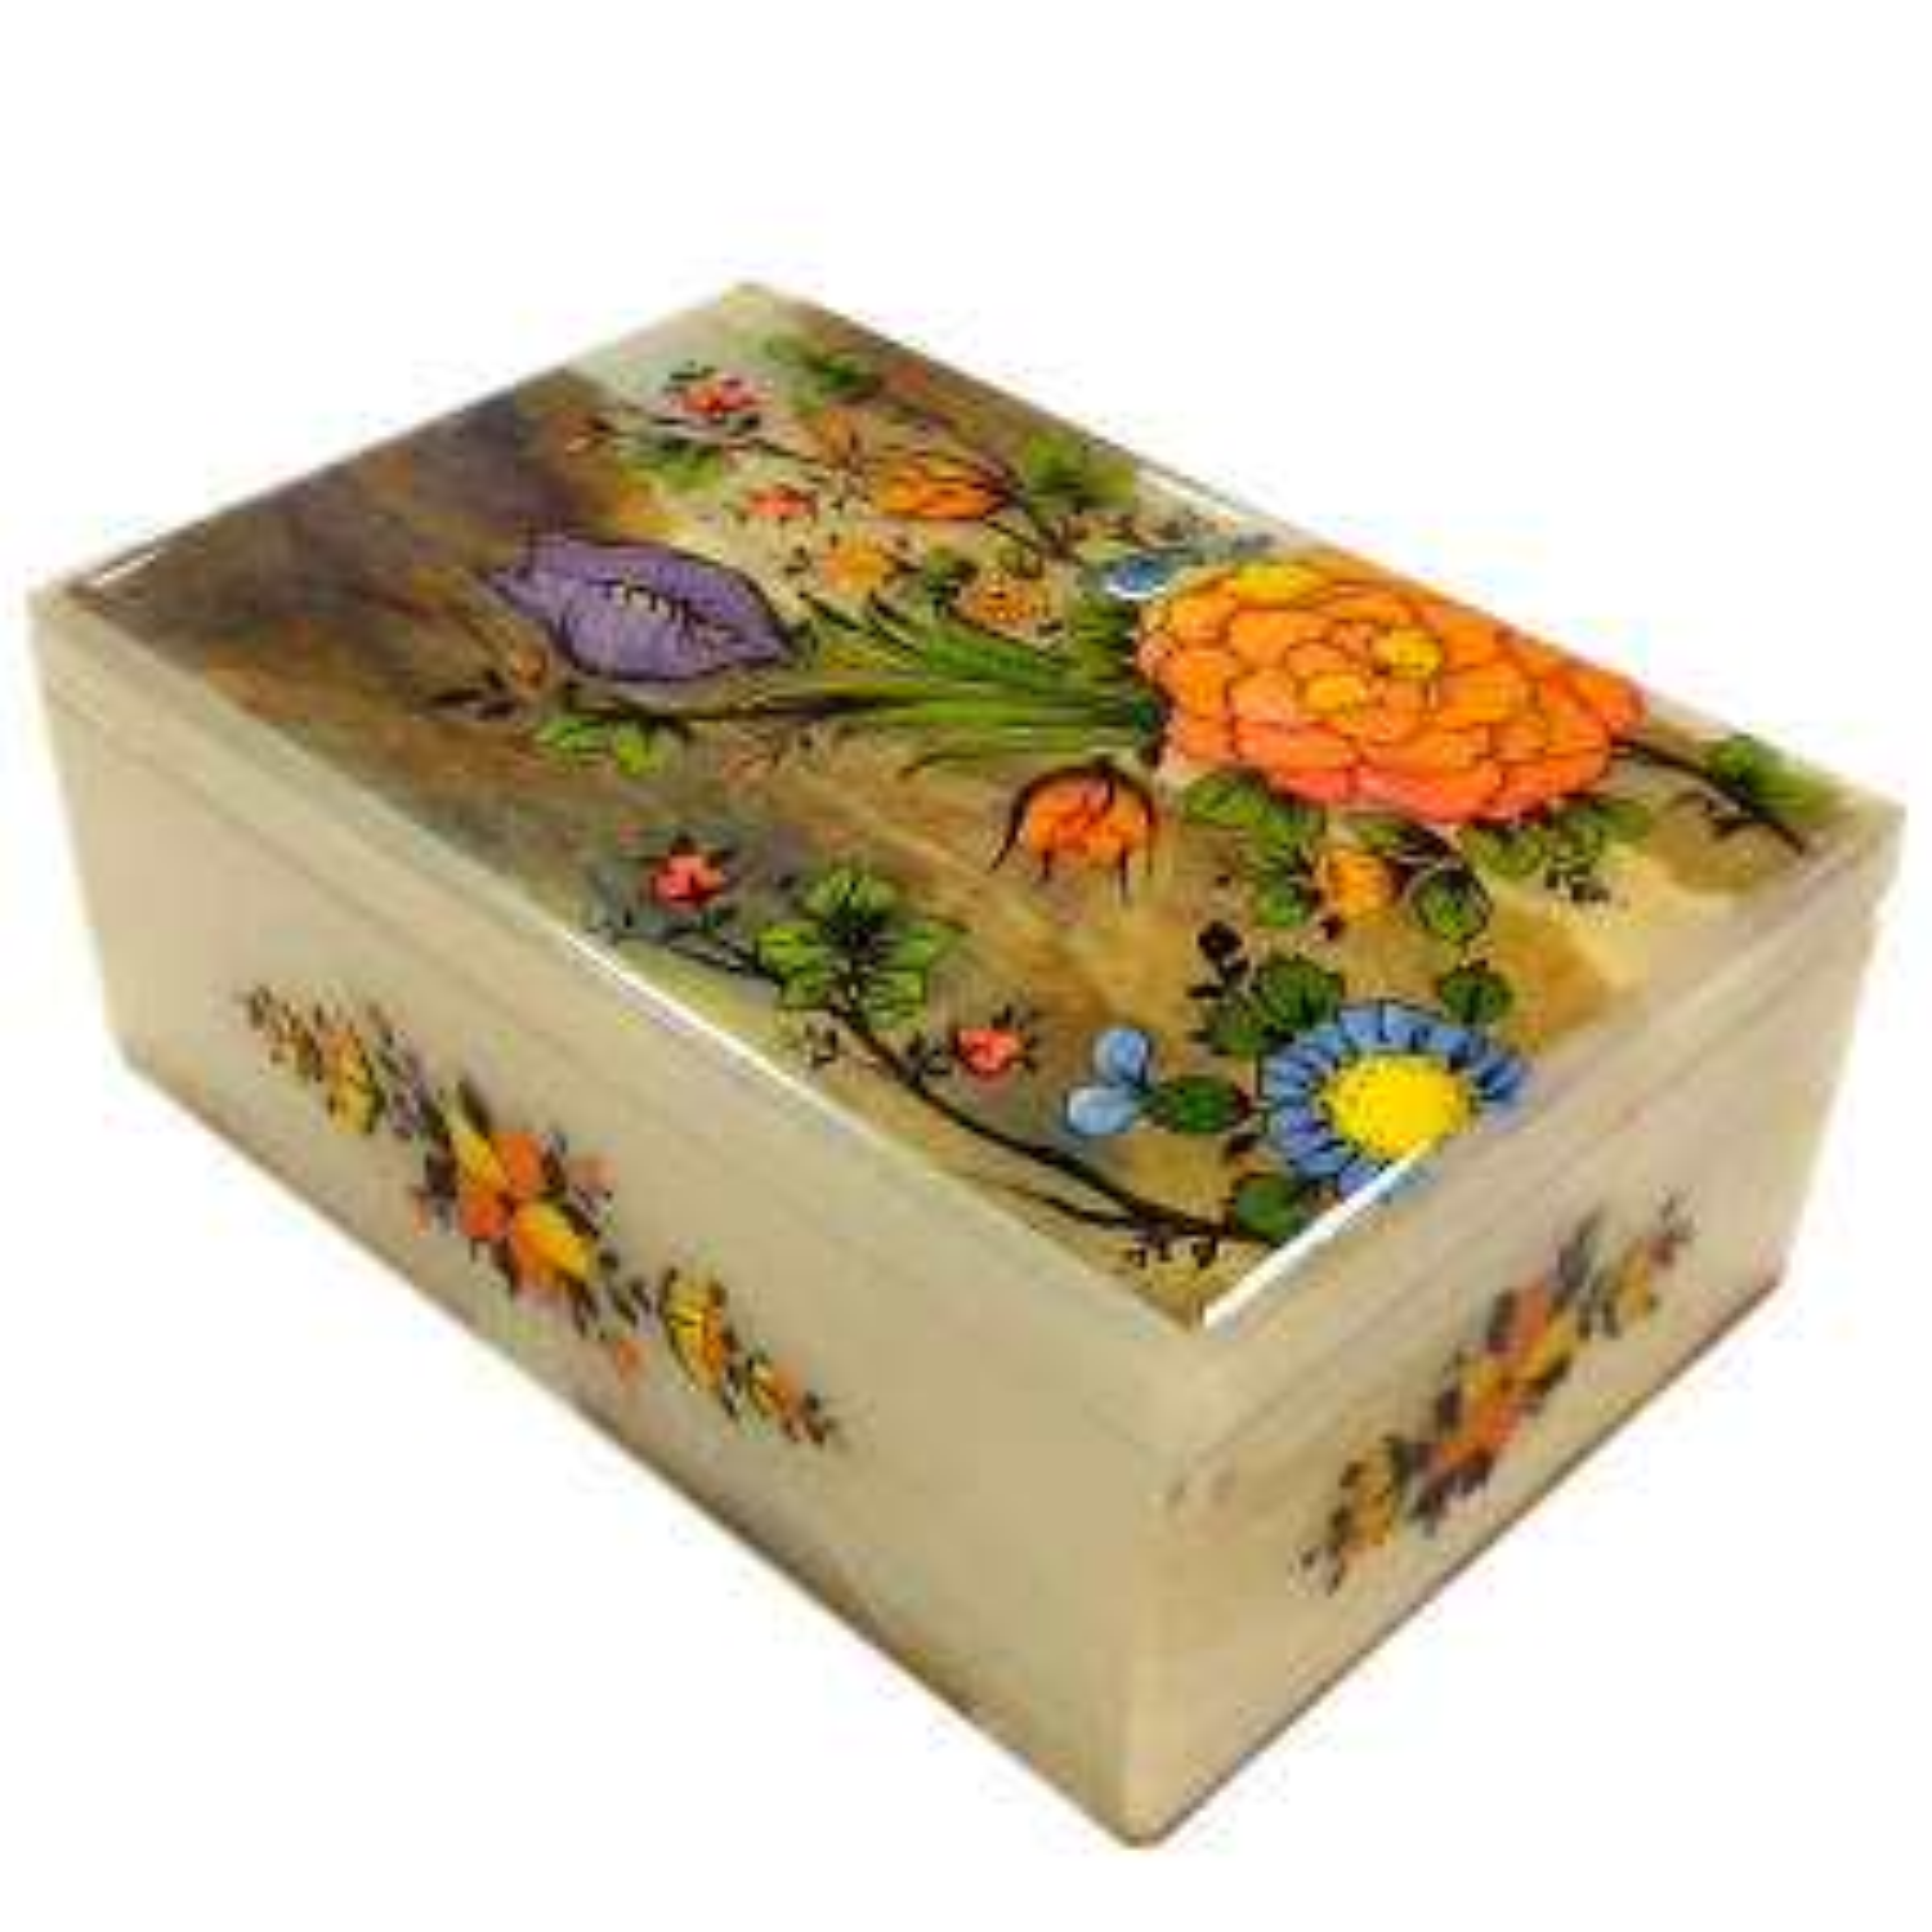 جعبه سنگی طرح گل و بوته کد 0099